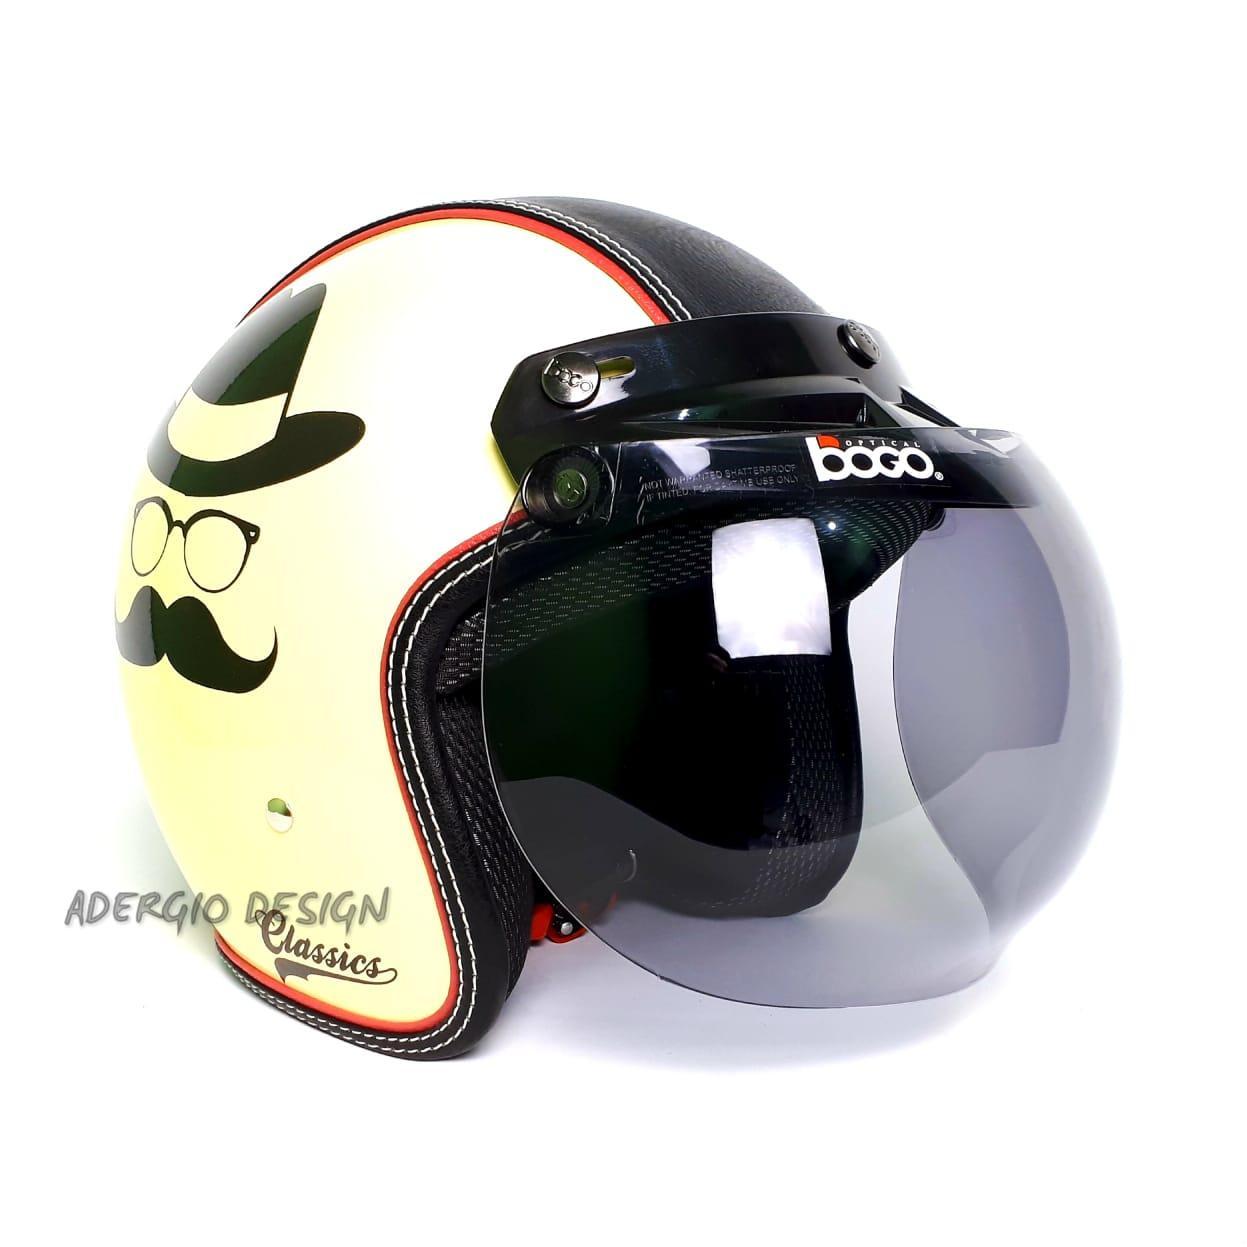 Jual List Helm Shoei Promo Cakil Hbc Rust Dust Hitam Doff Emas Bogo Classic Kaca Ori Sni Semi Kulit Motif Mustache Cream Merah